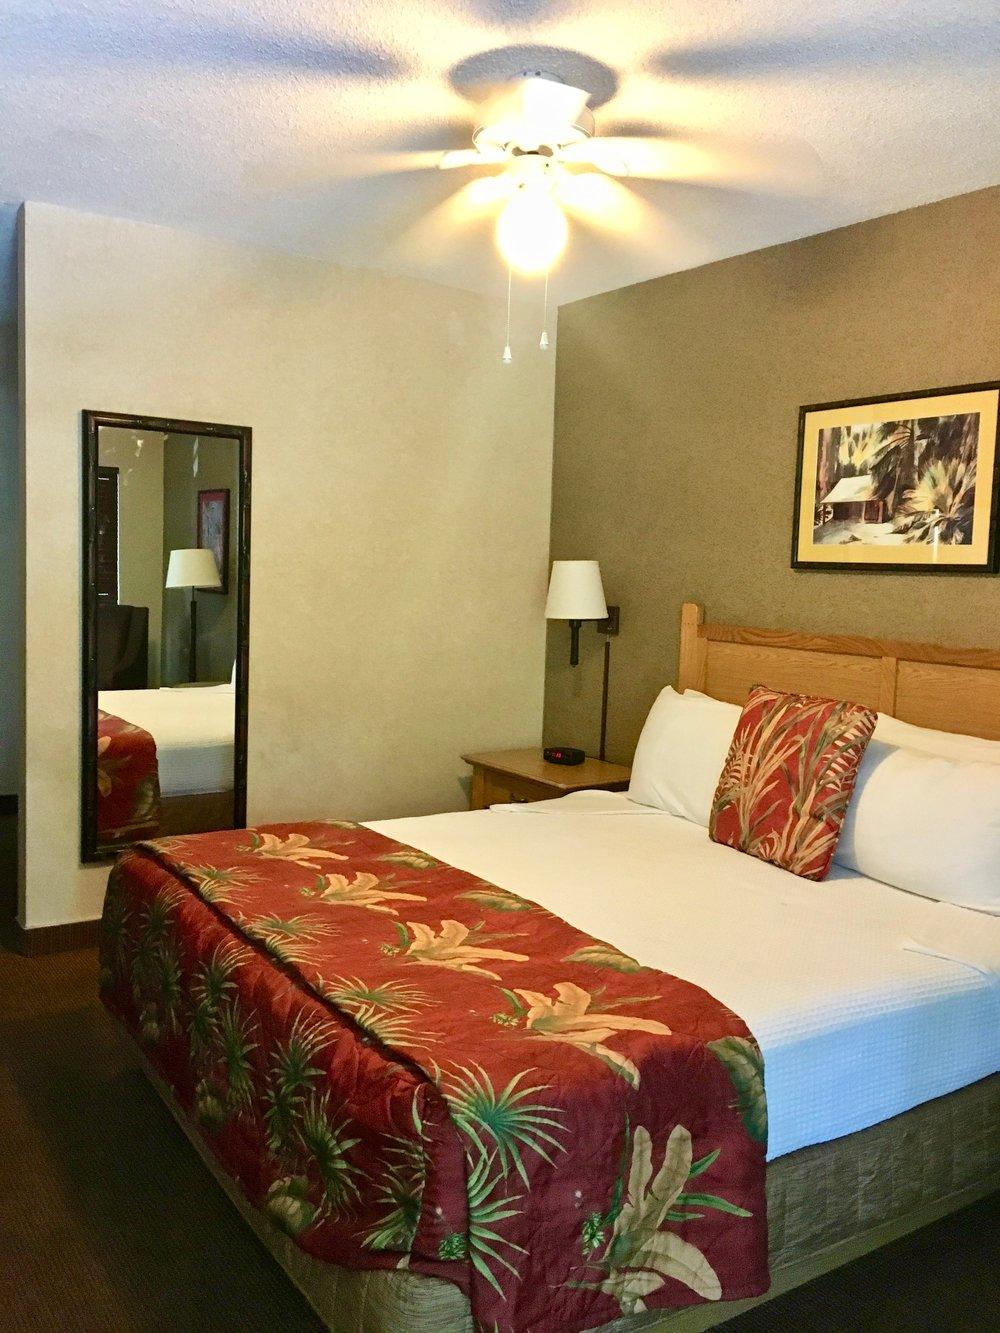 caliente-tropics-hotel-room.jpg